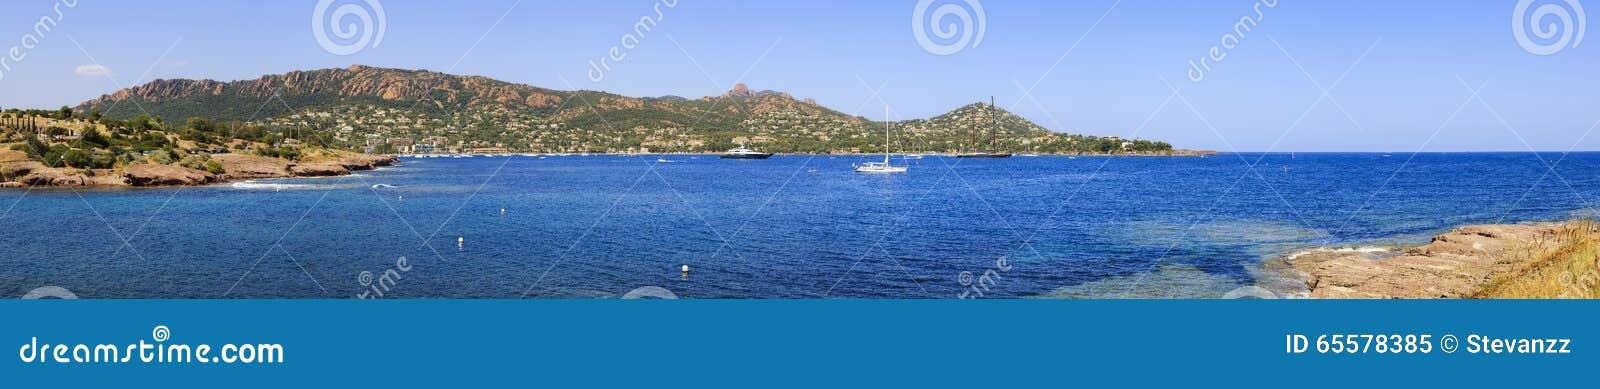 O panorama da baía de Agay em Esterel balança a costa e o mar da praia Costa Azu